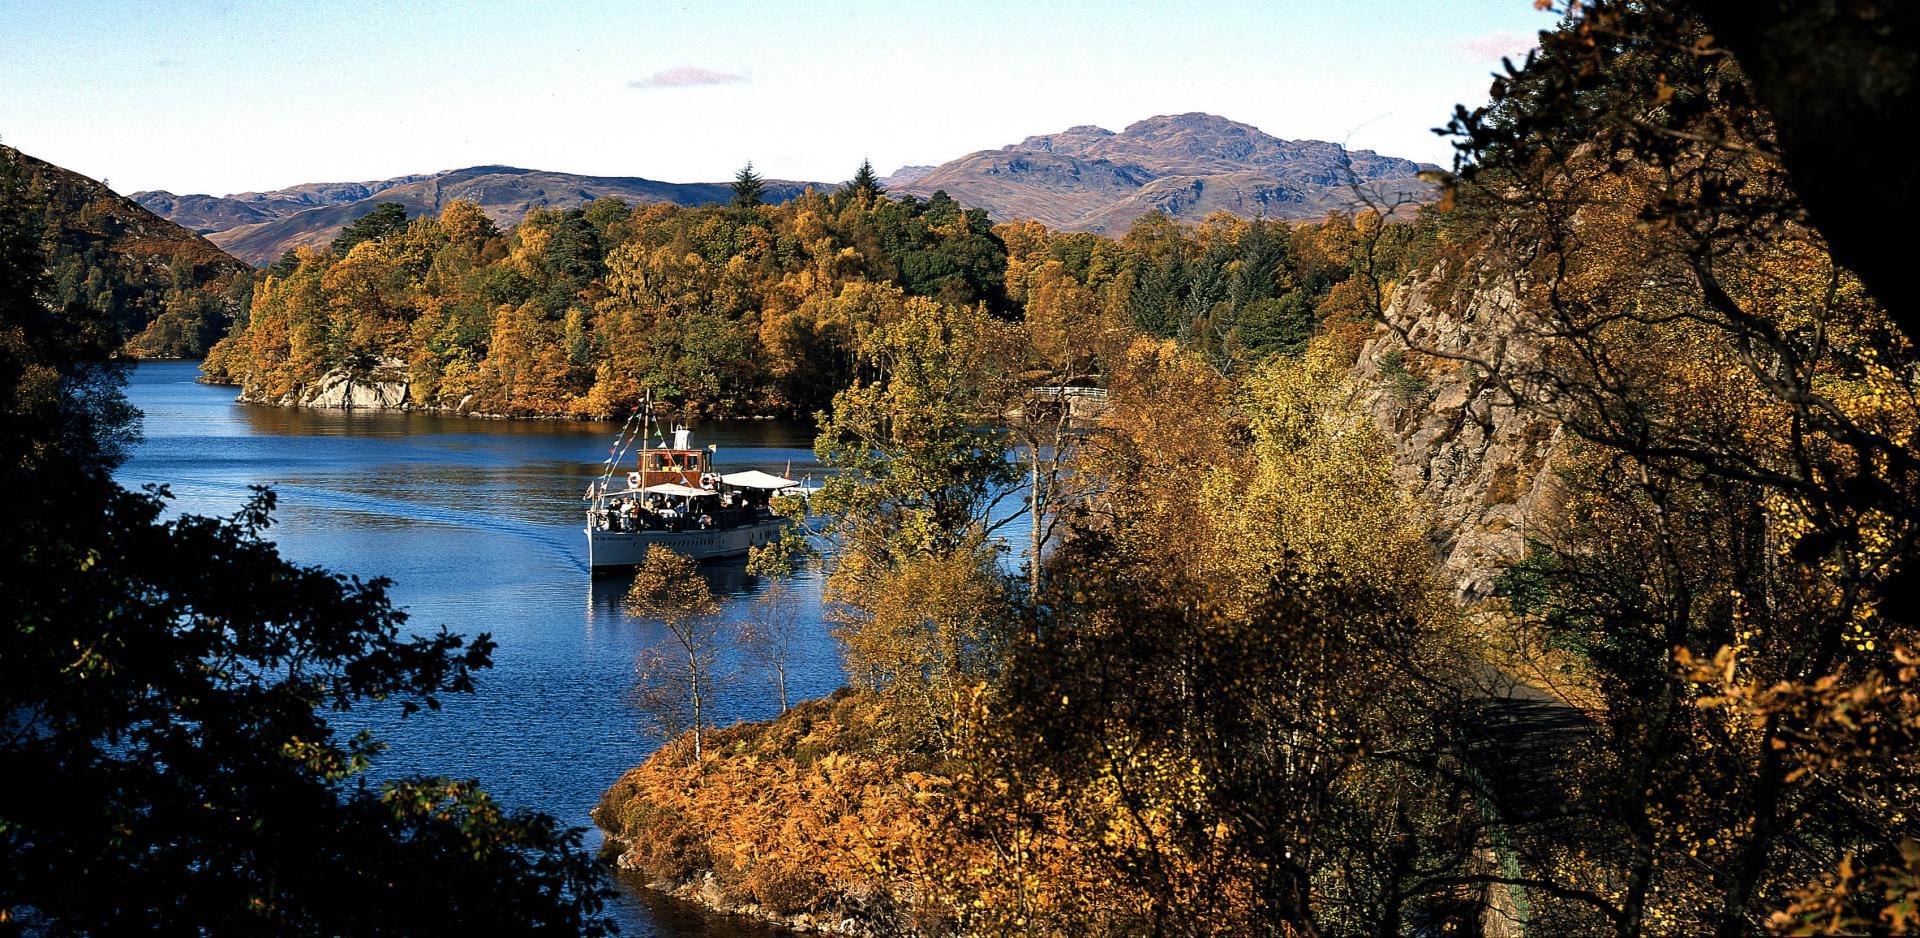 Autovakantie Schotland Loch Lomonds